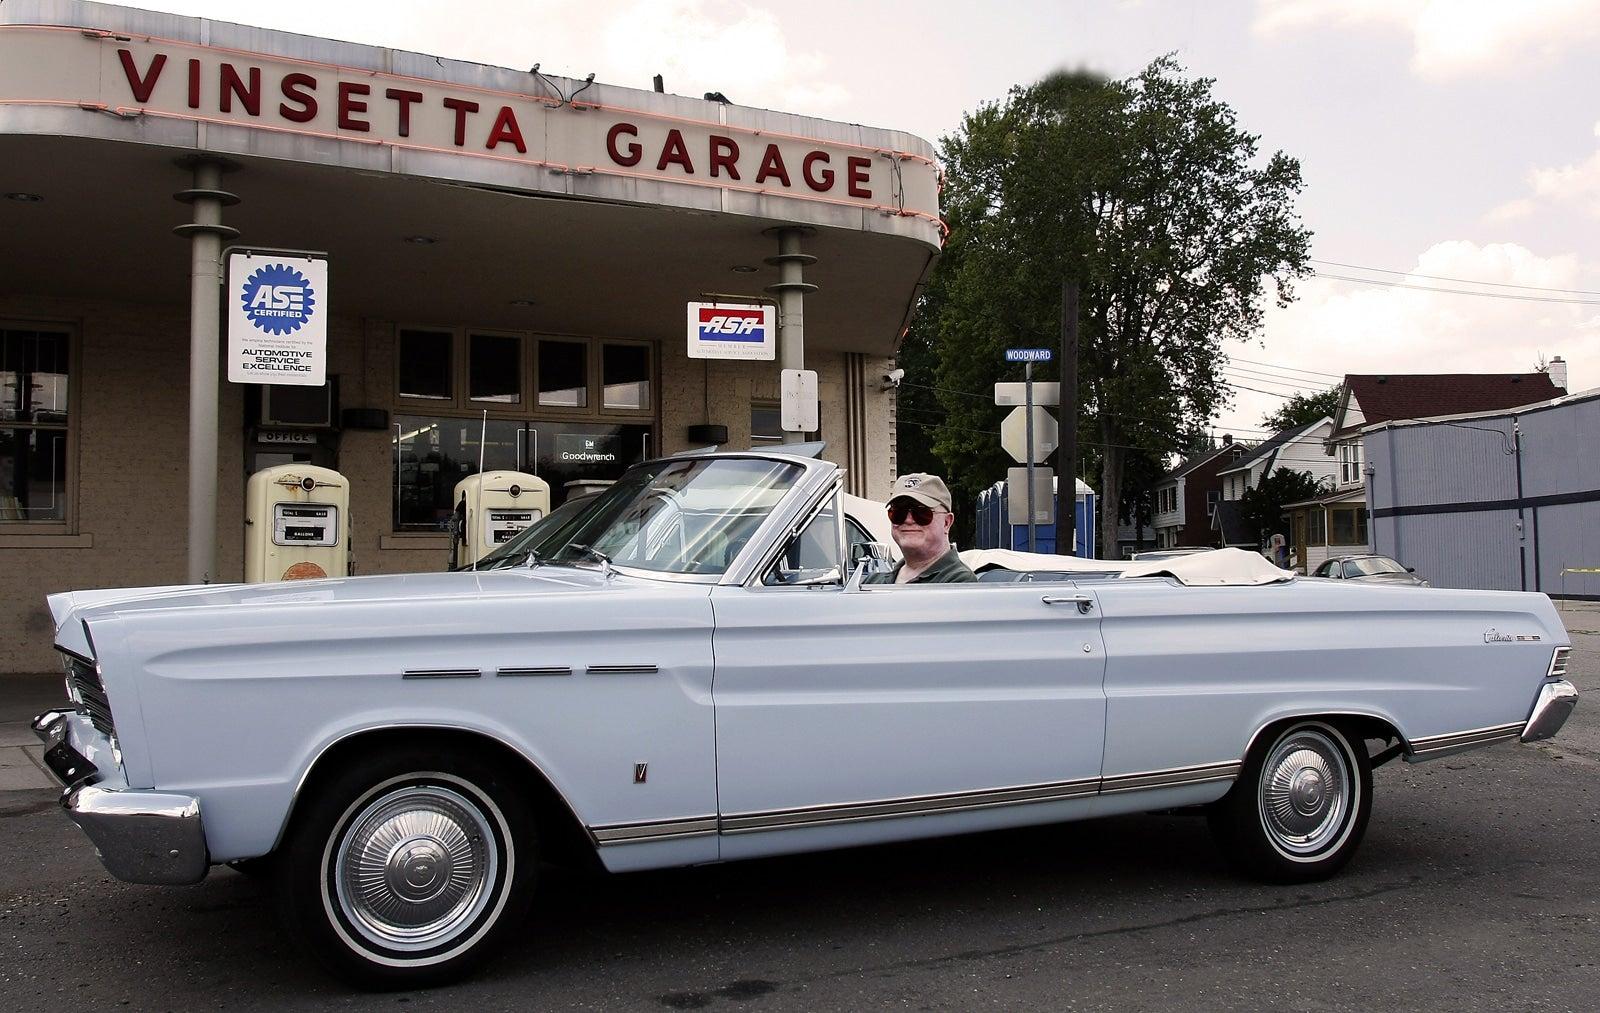 Big Change in Store for Classic Woodward Dream Cruiser Garage